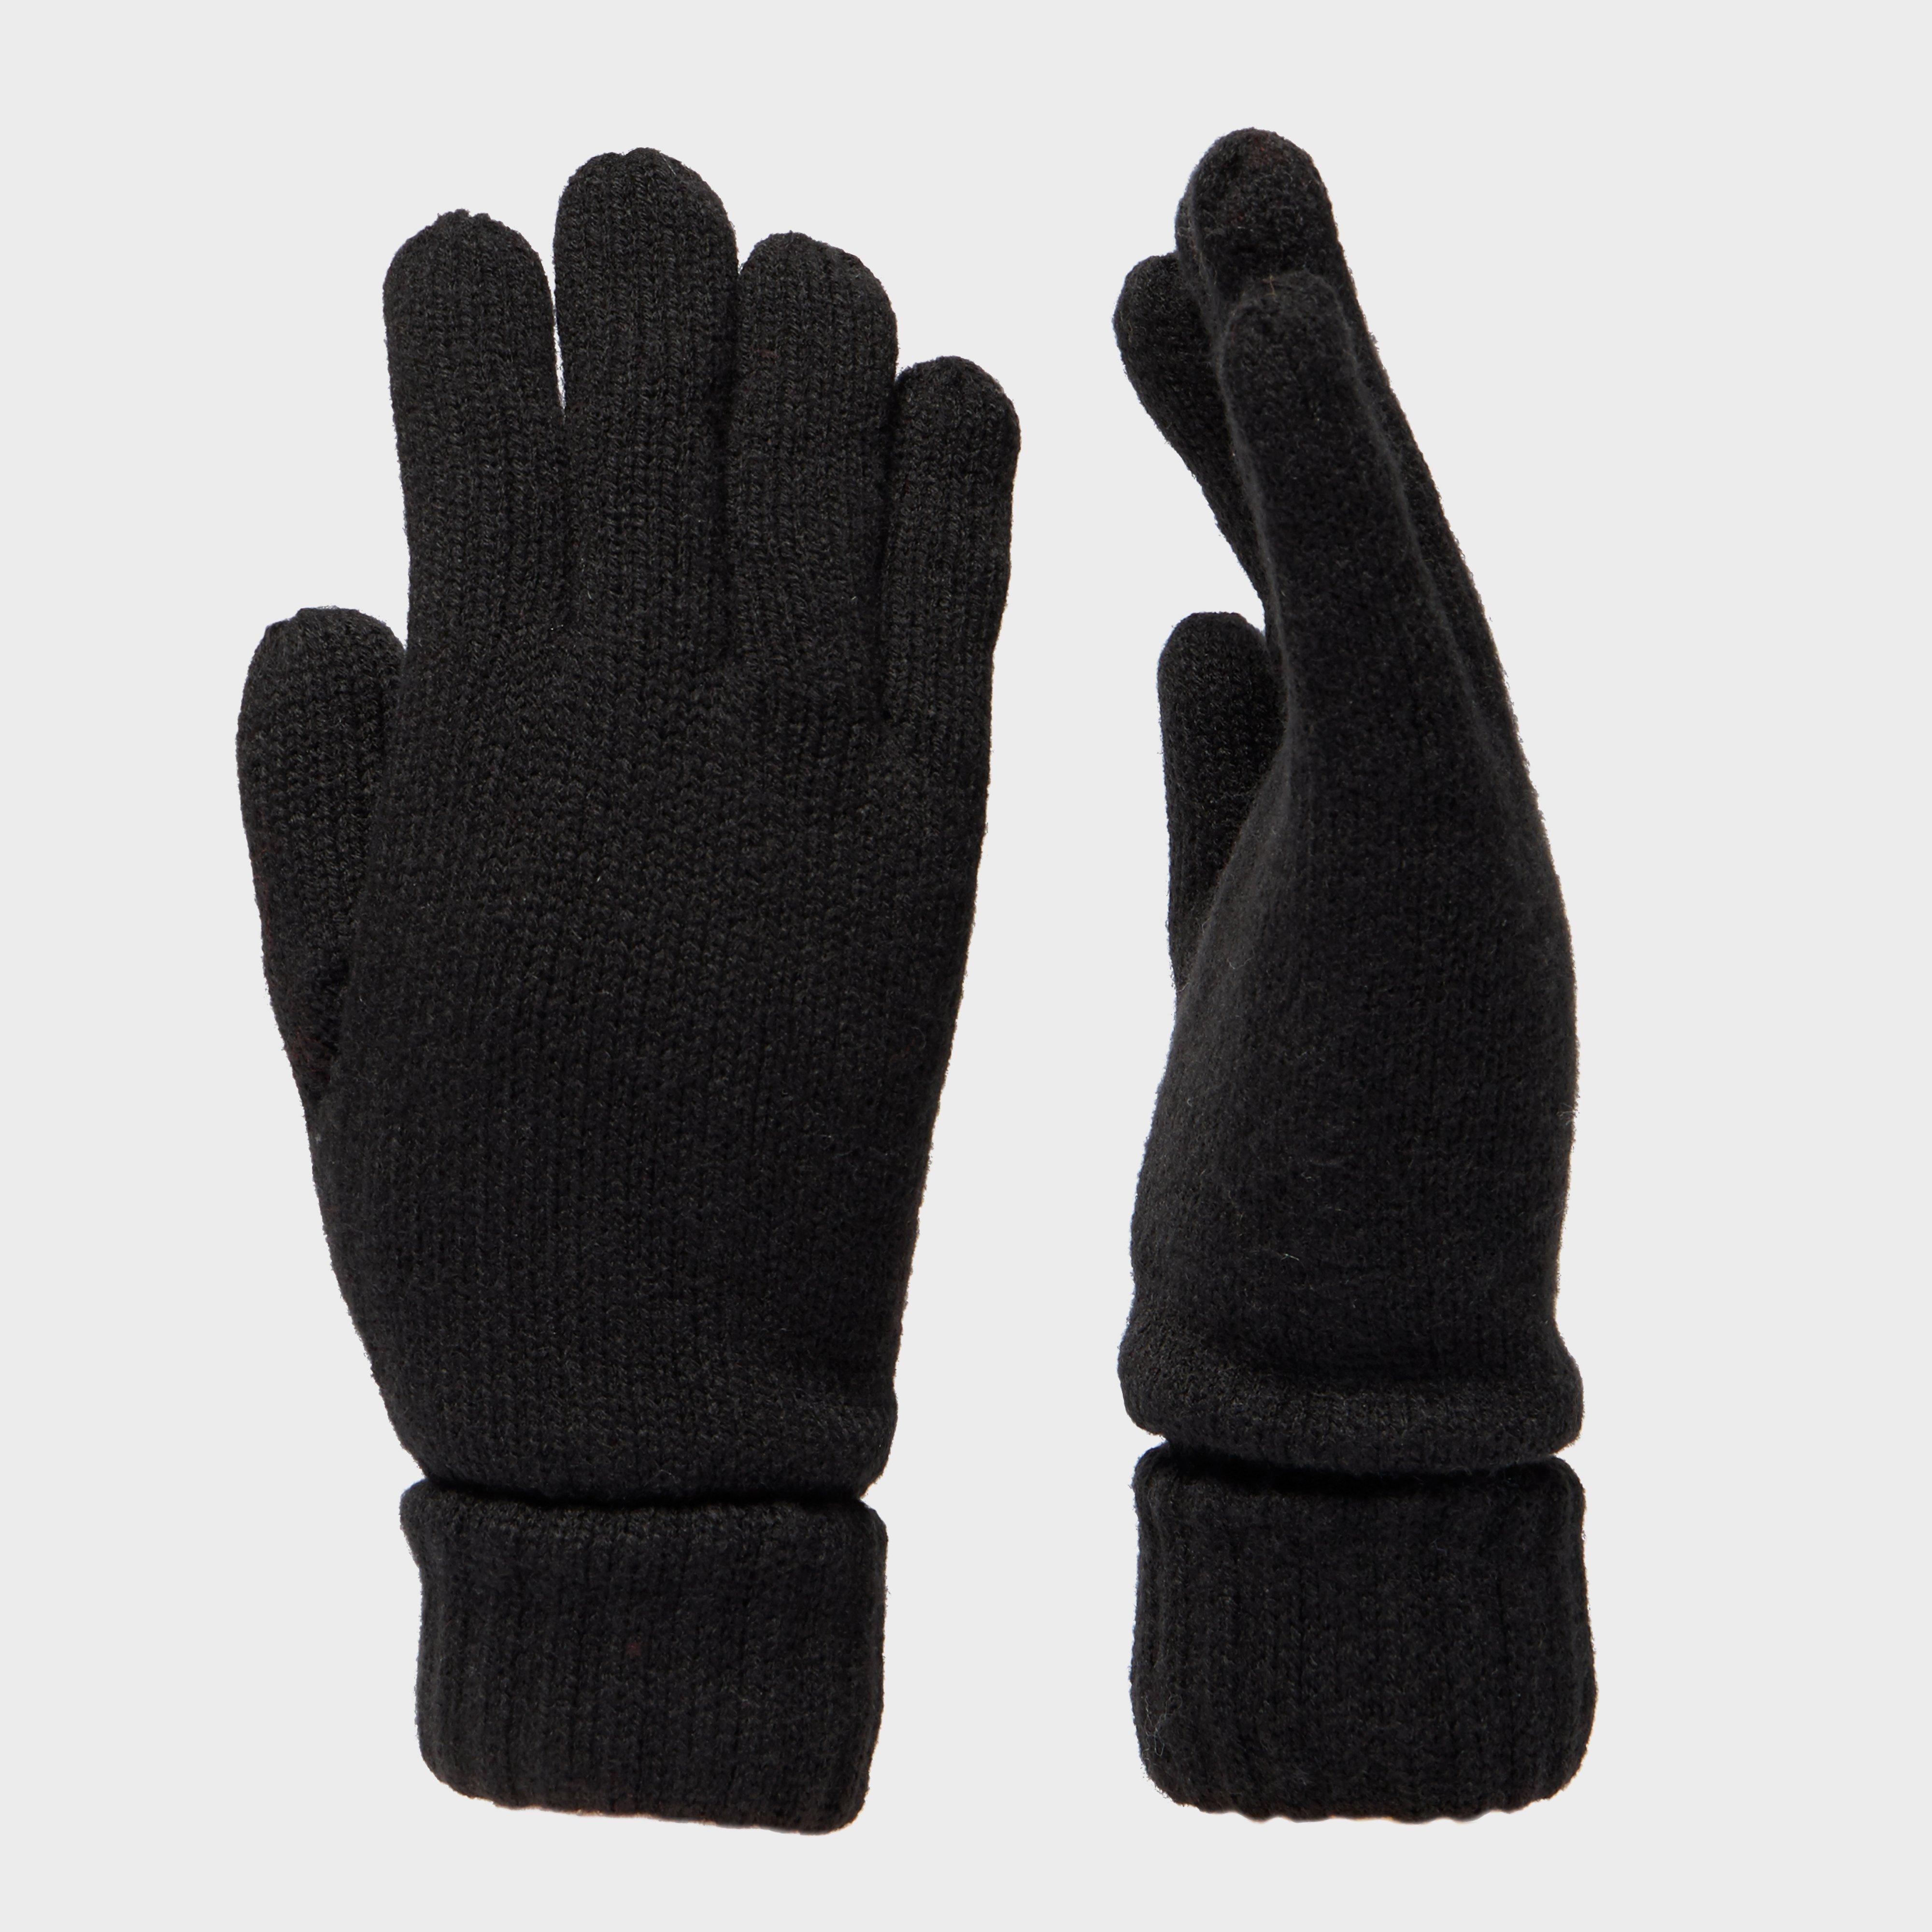 Peter Storm Unisex Borg Glove, Black